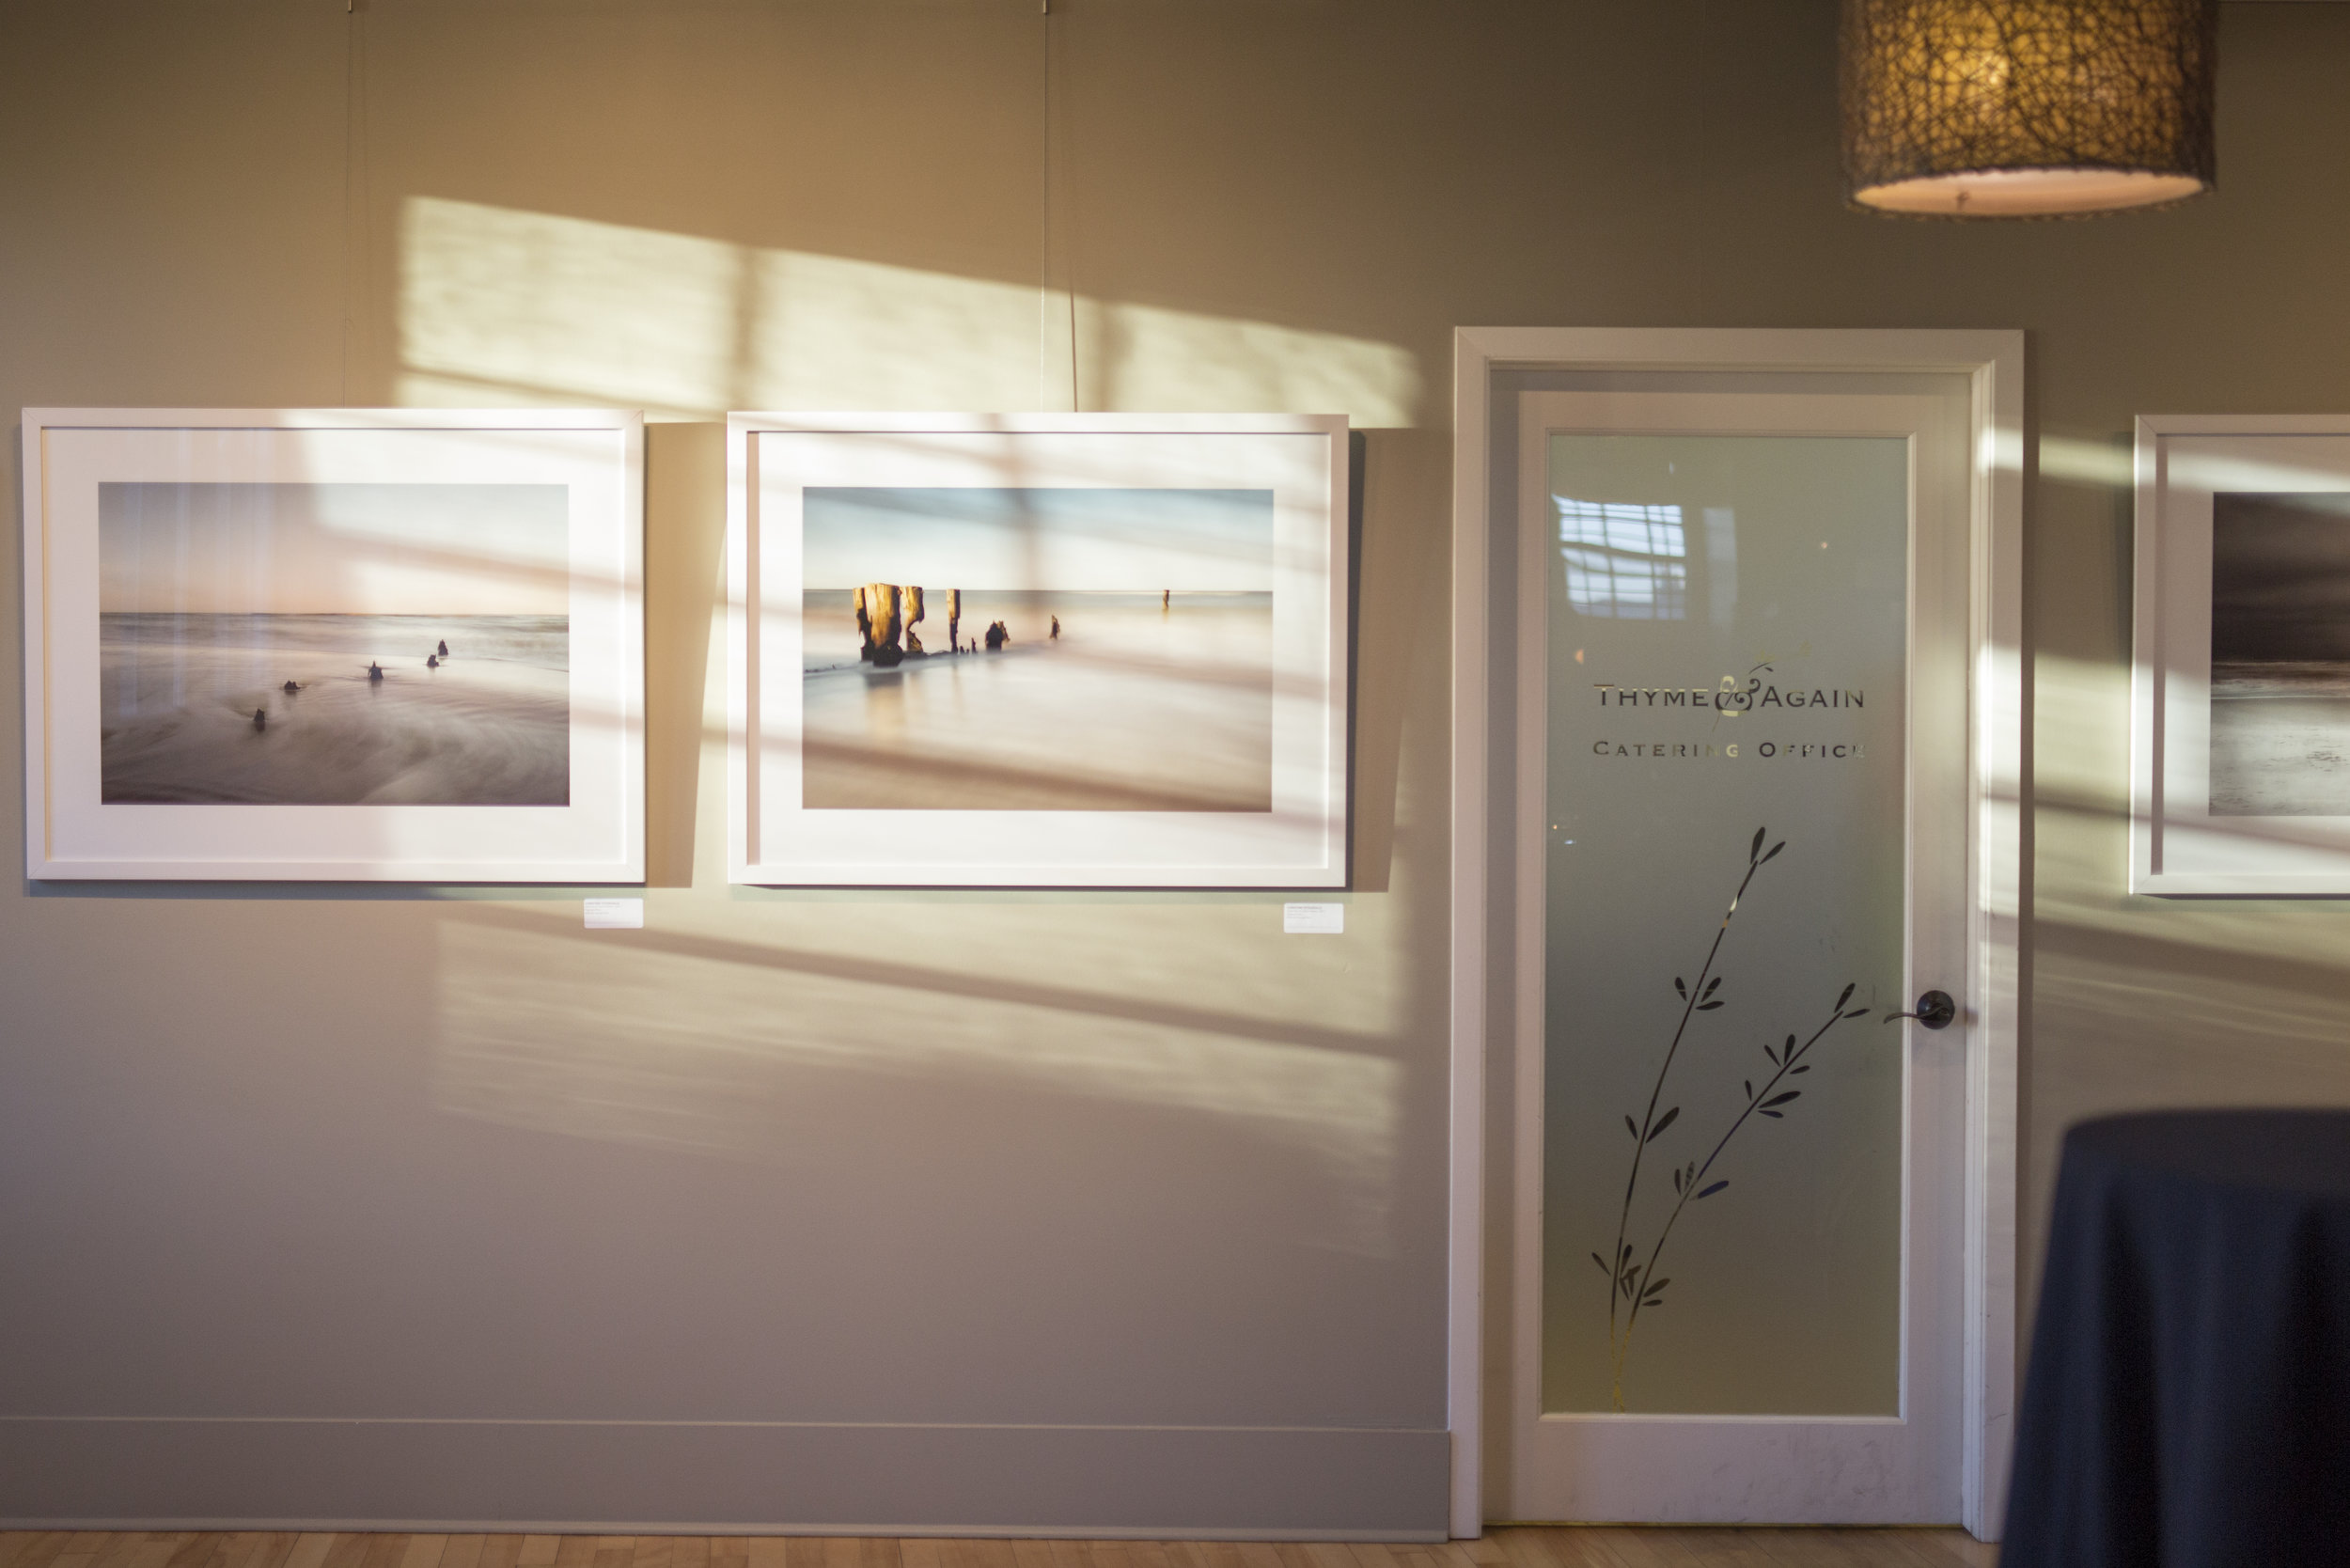 Erosion Exhibition, Exposure Gallery, 2015